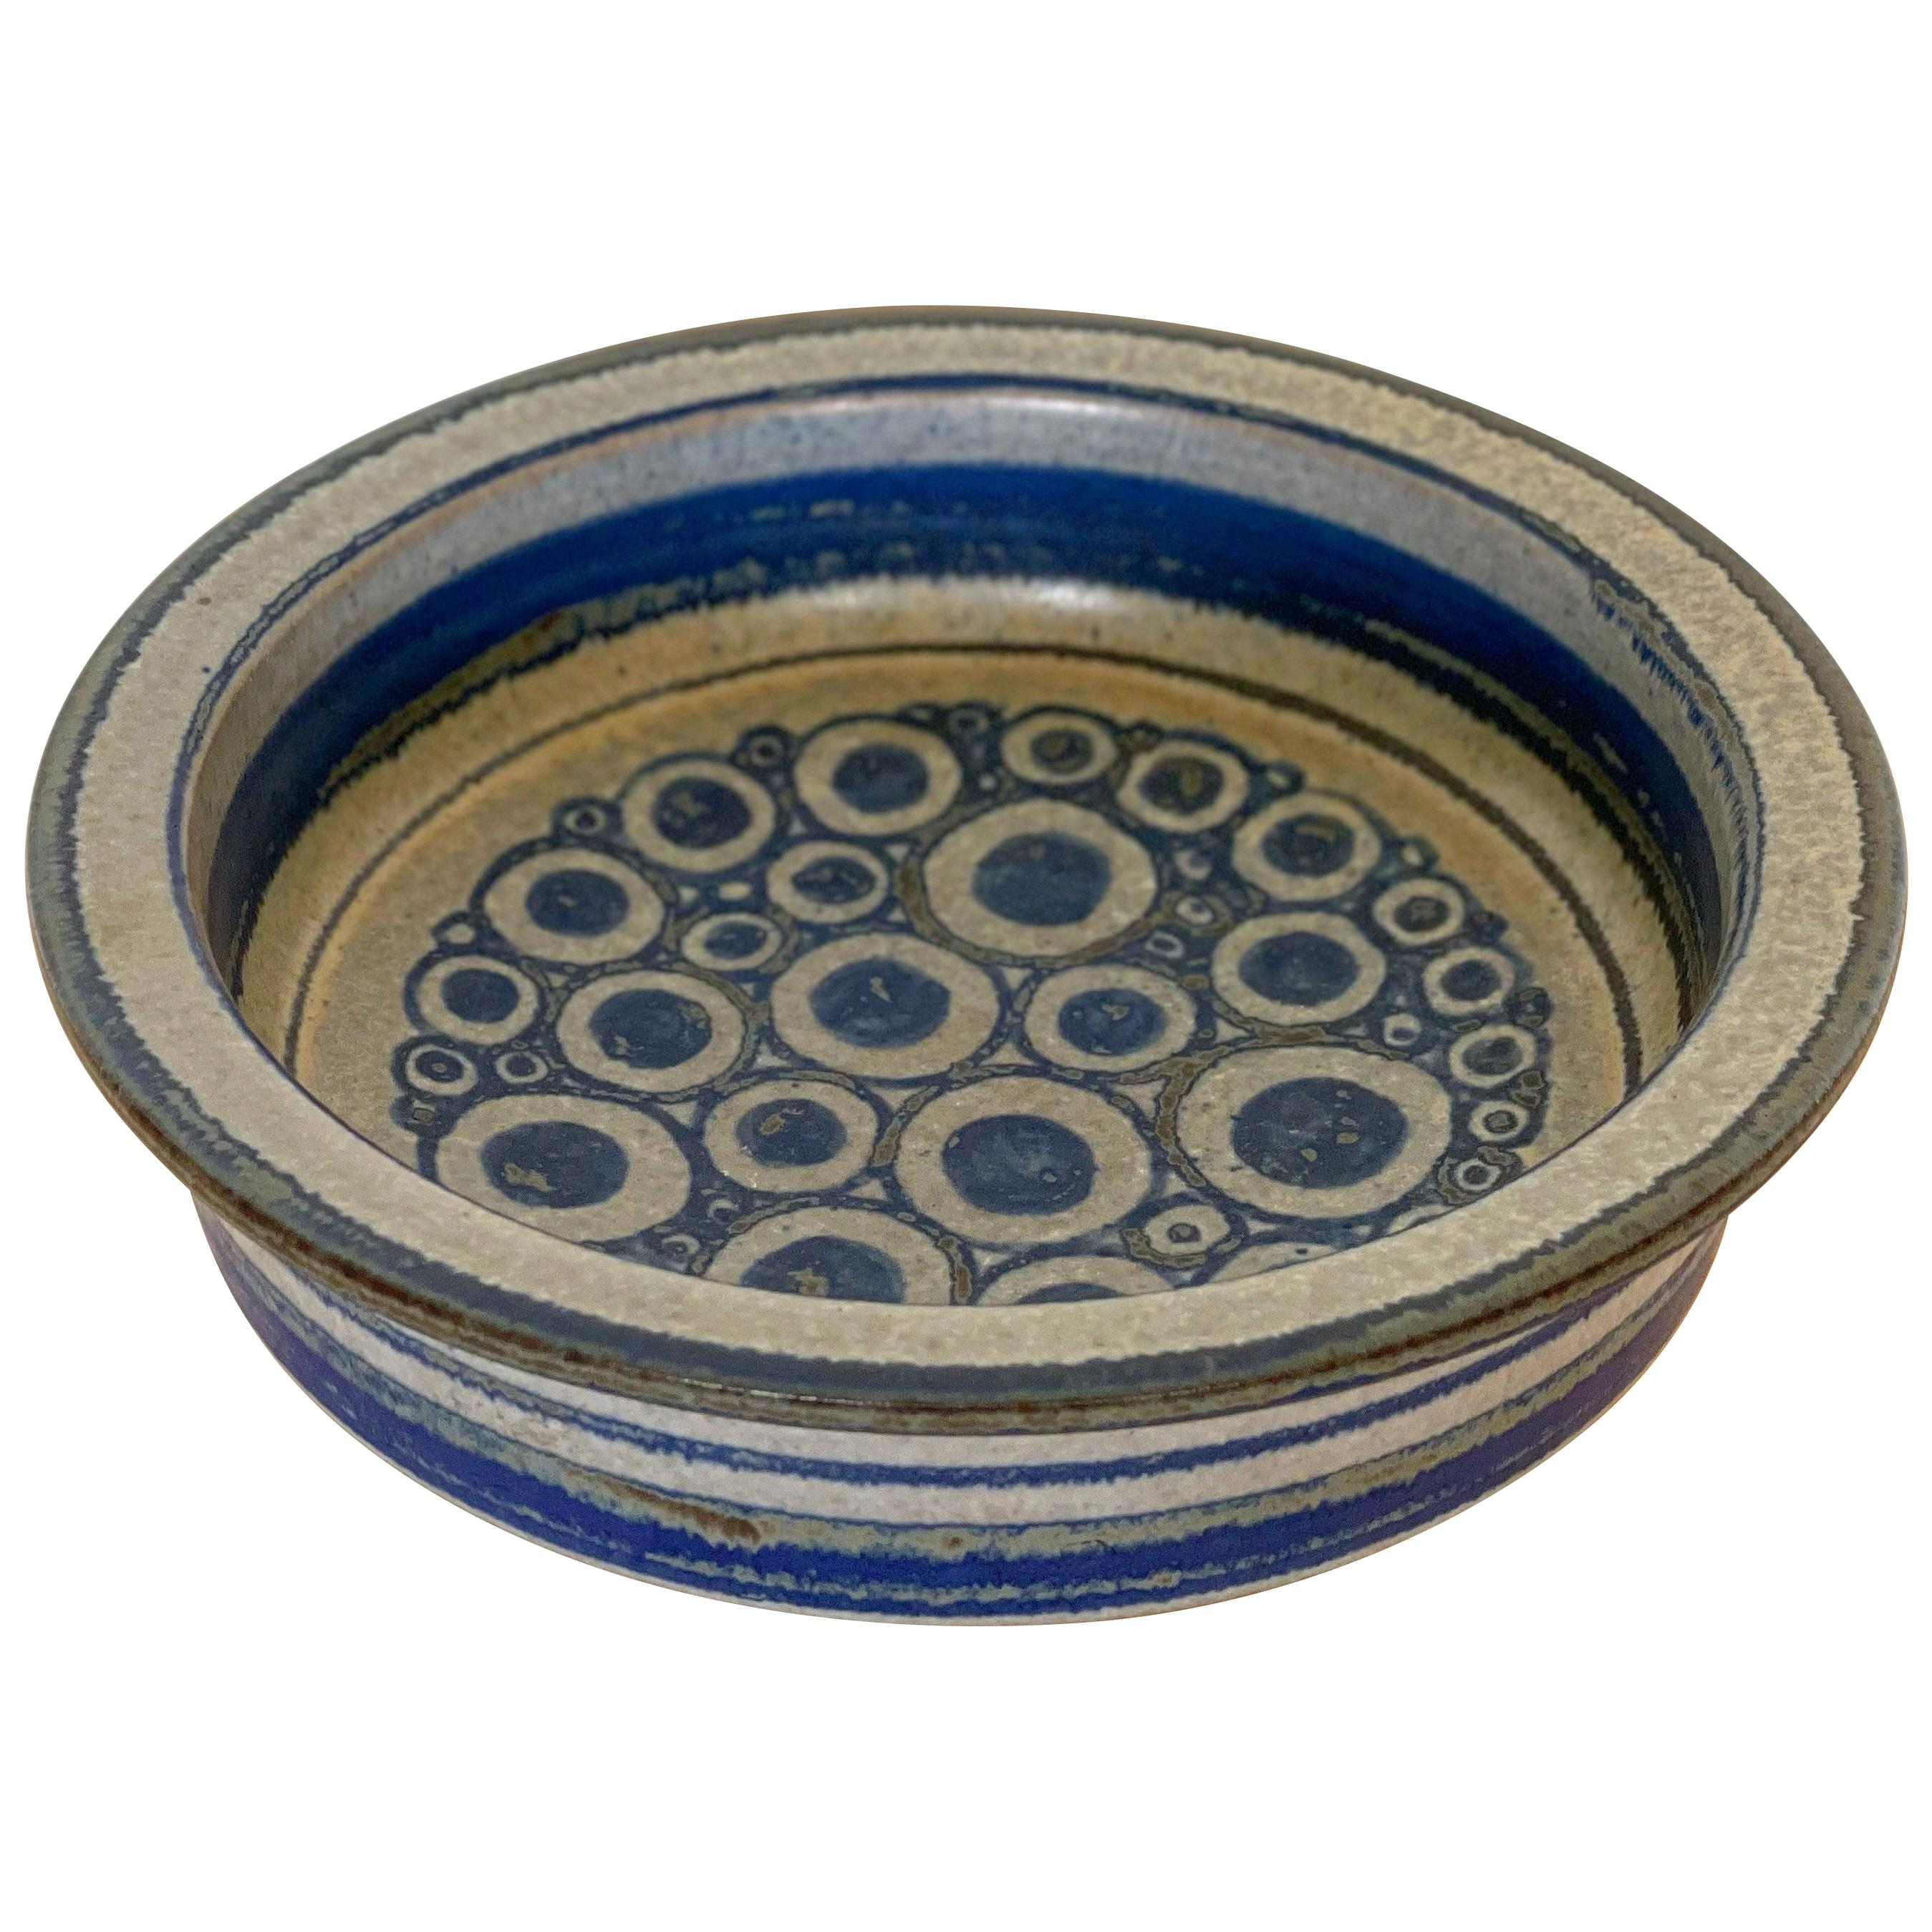 Marianne Starck for Michael Andersen Danish Modern Ceramic Bowl Persia Glaze